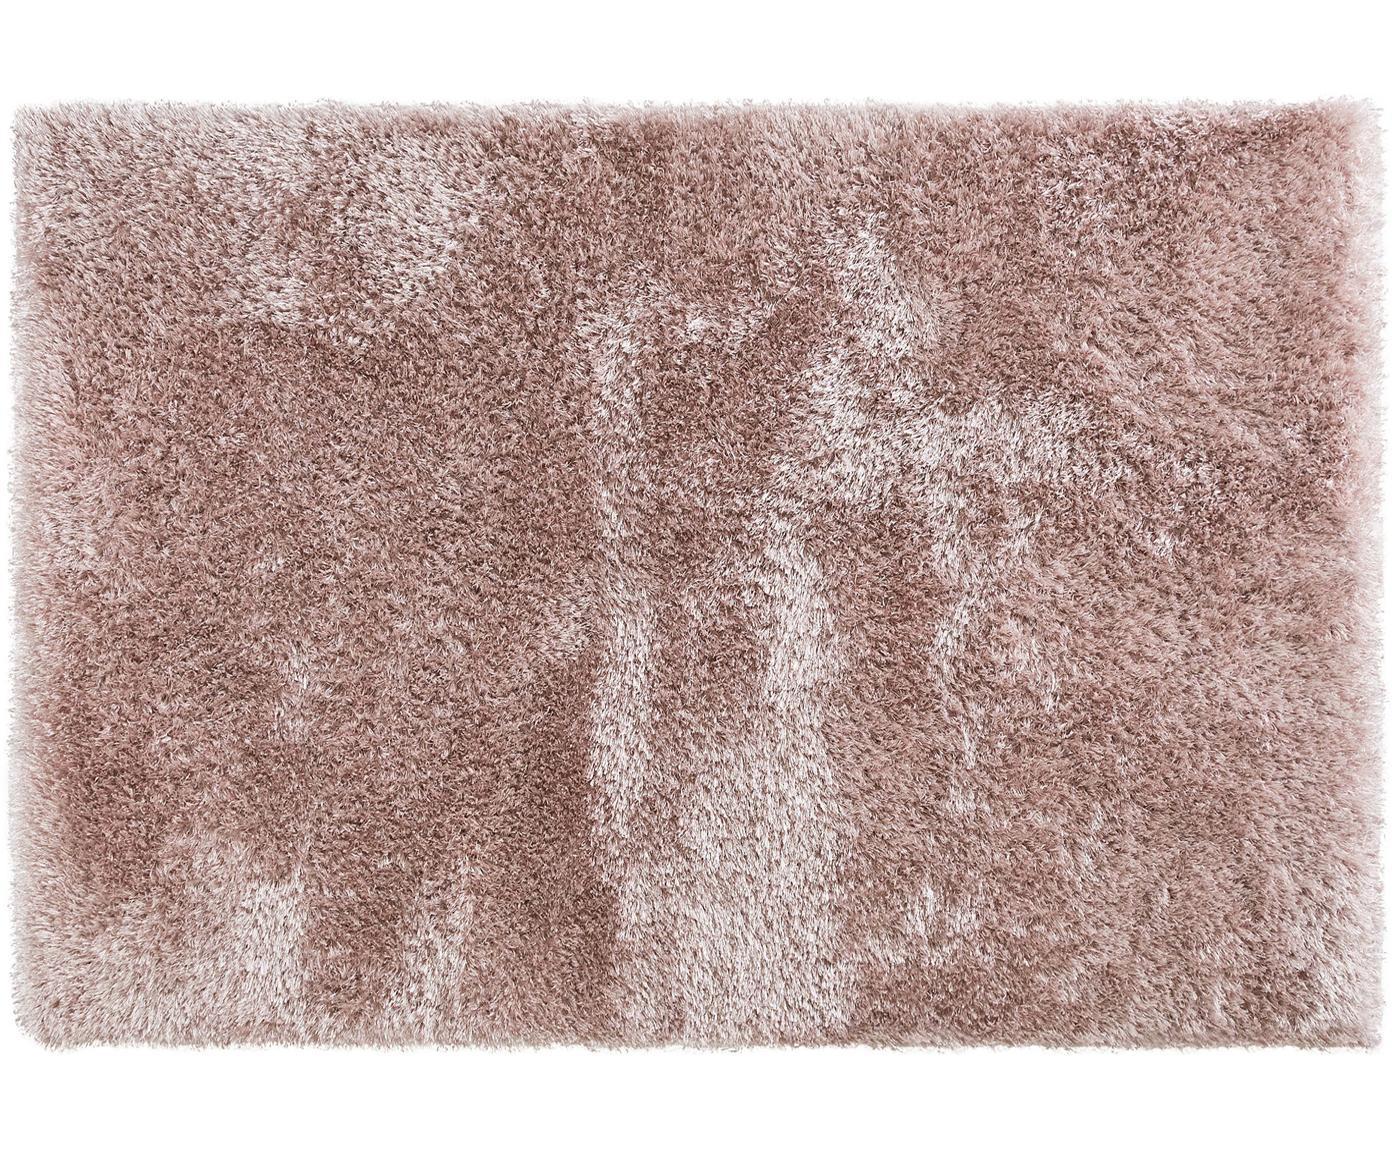 Alfombra de pelo largo Lea, 50%poliéster, 50%polipropileno, Rosa, An 140 x L 200 cm (Tamaño S)